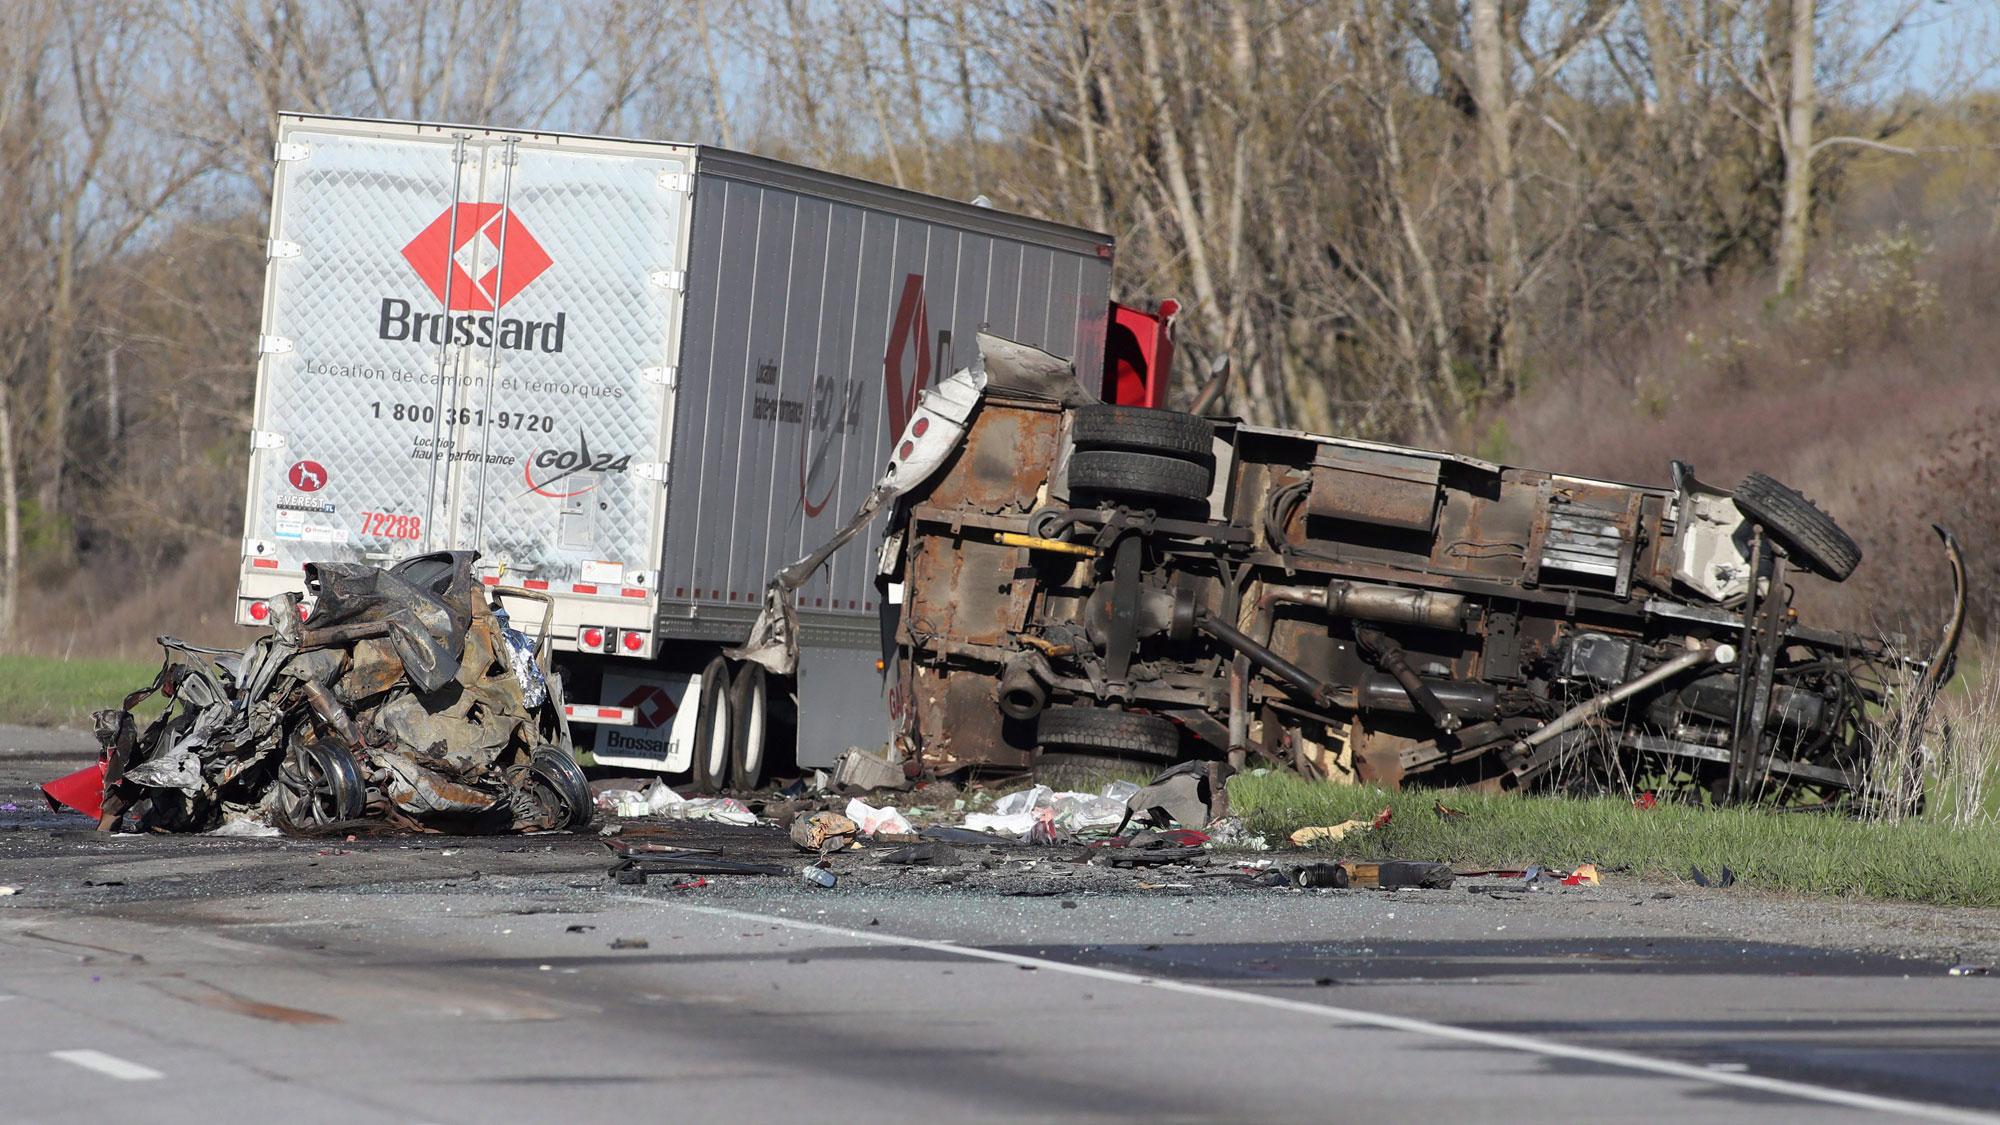 Toronto Car Accident Today